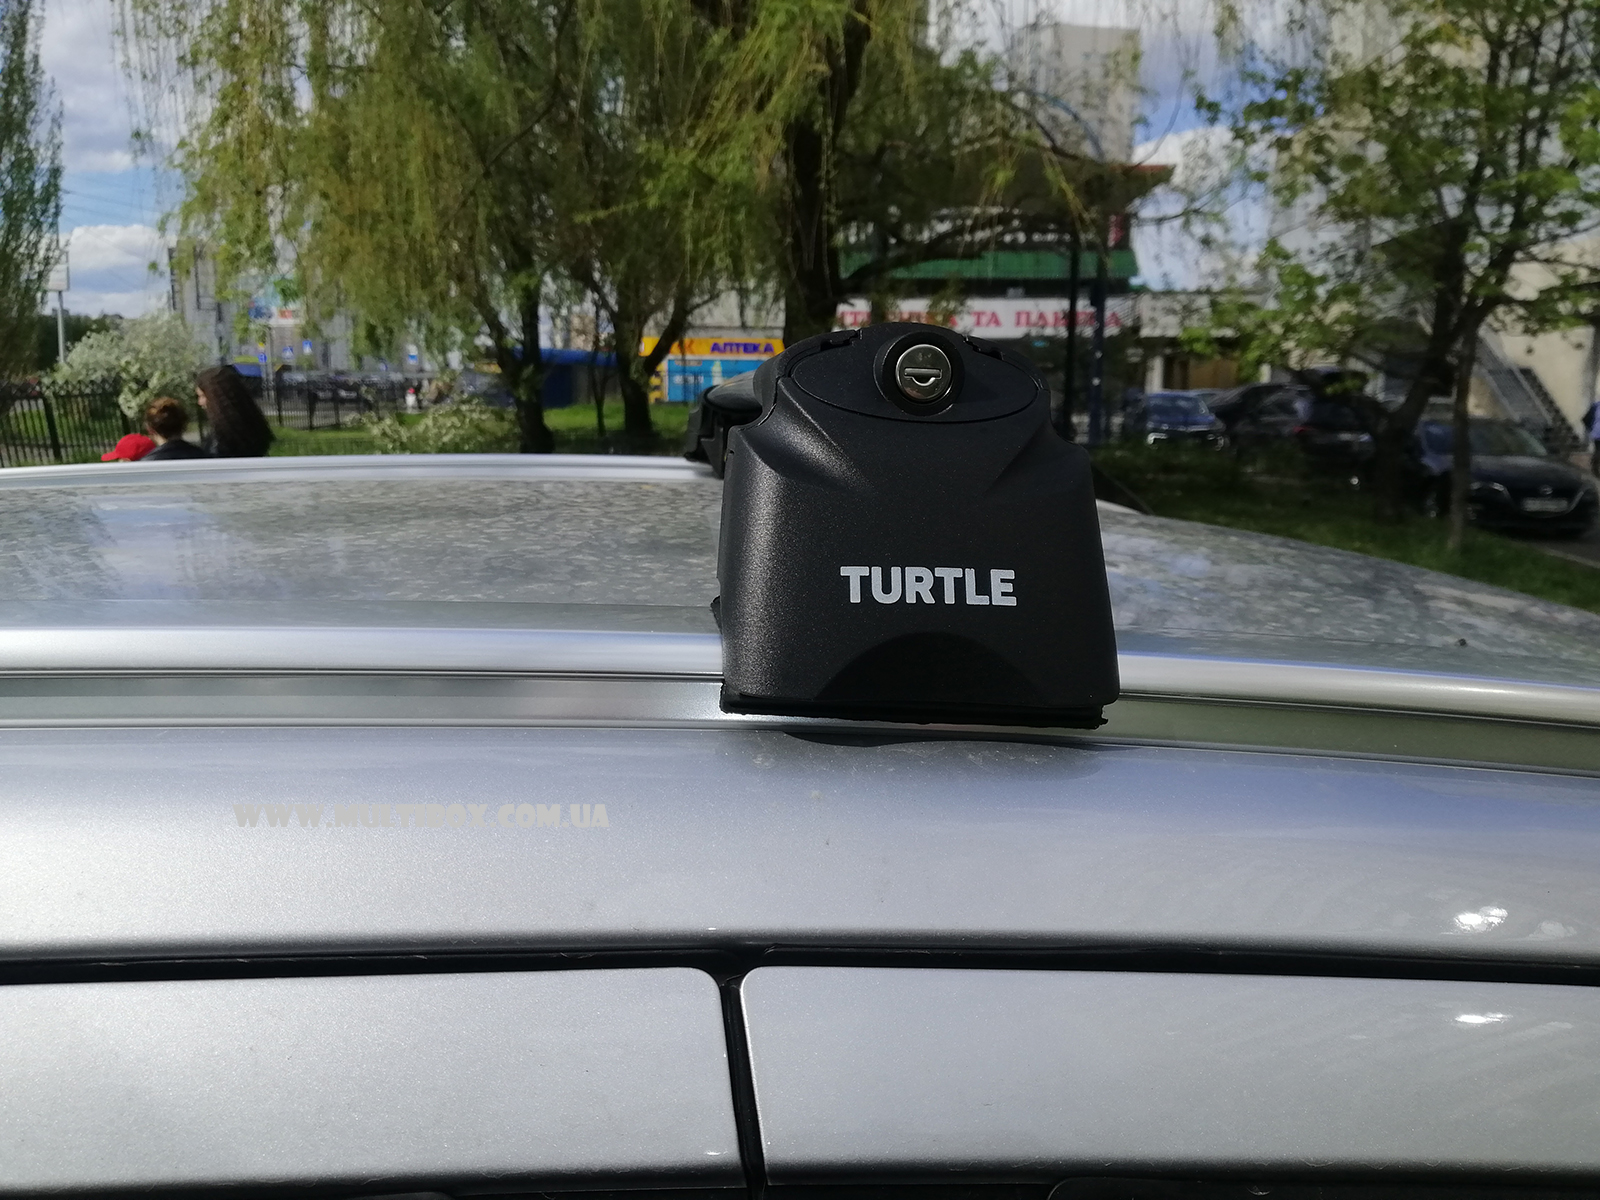 Багажник поперечины на крышу на машину Сузуки SX4 С-Кросс / Suzuki SX4 S-Cross